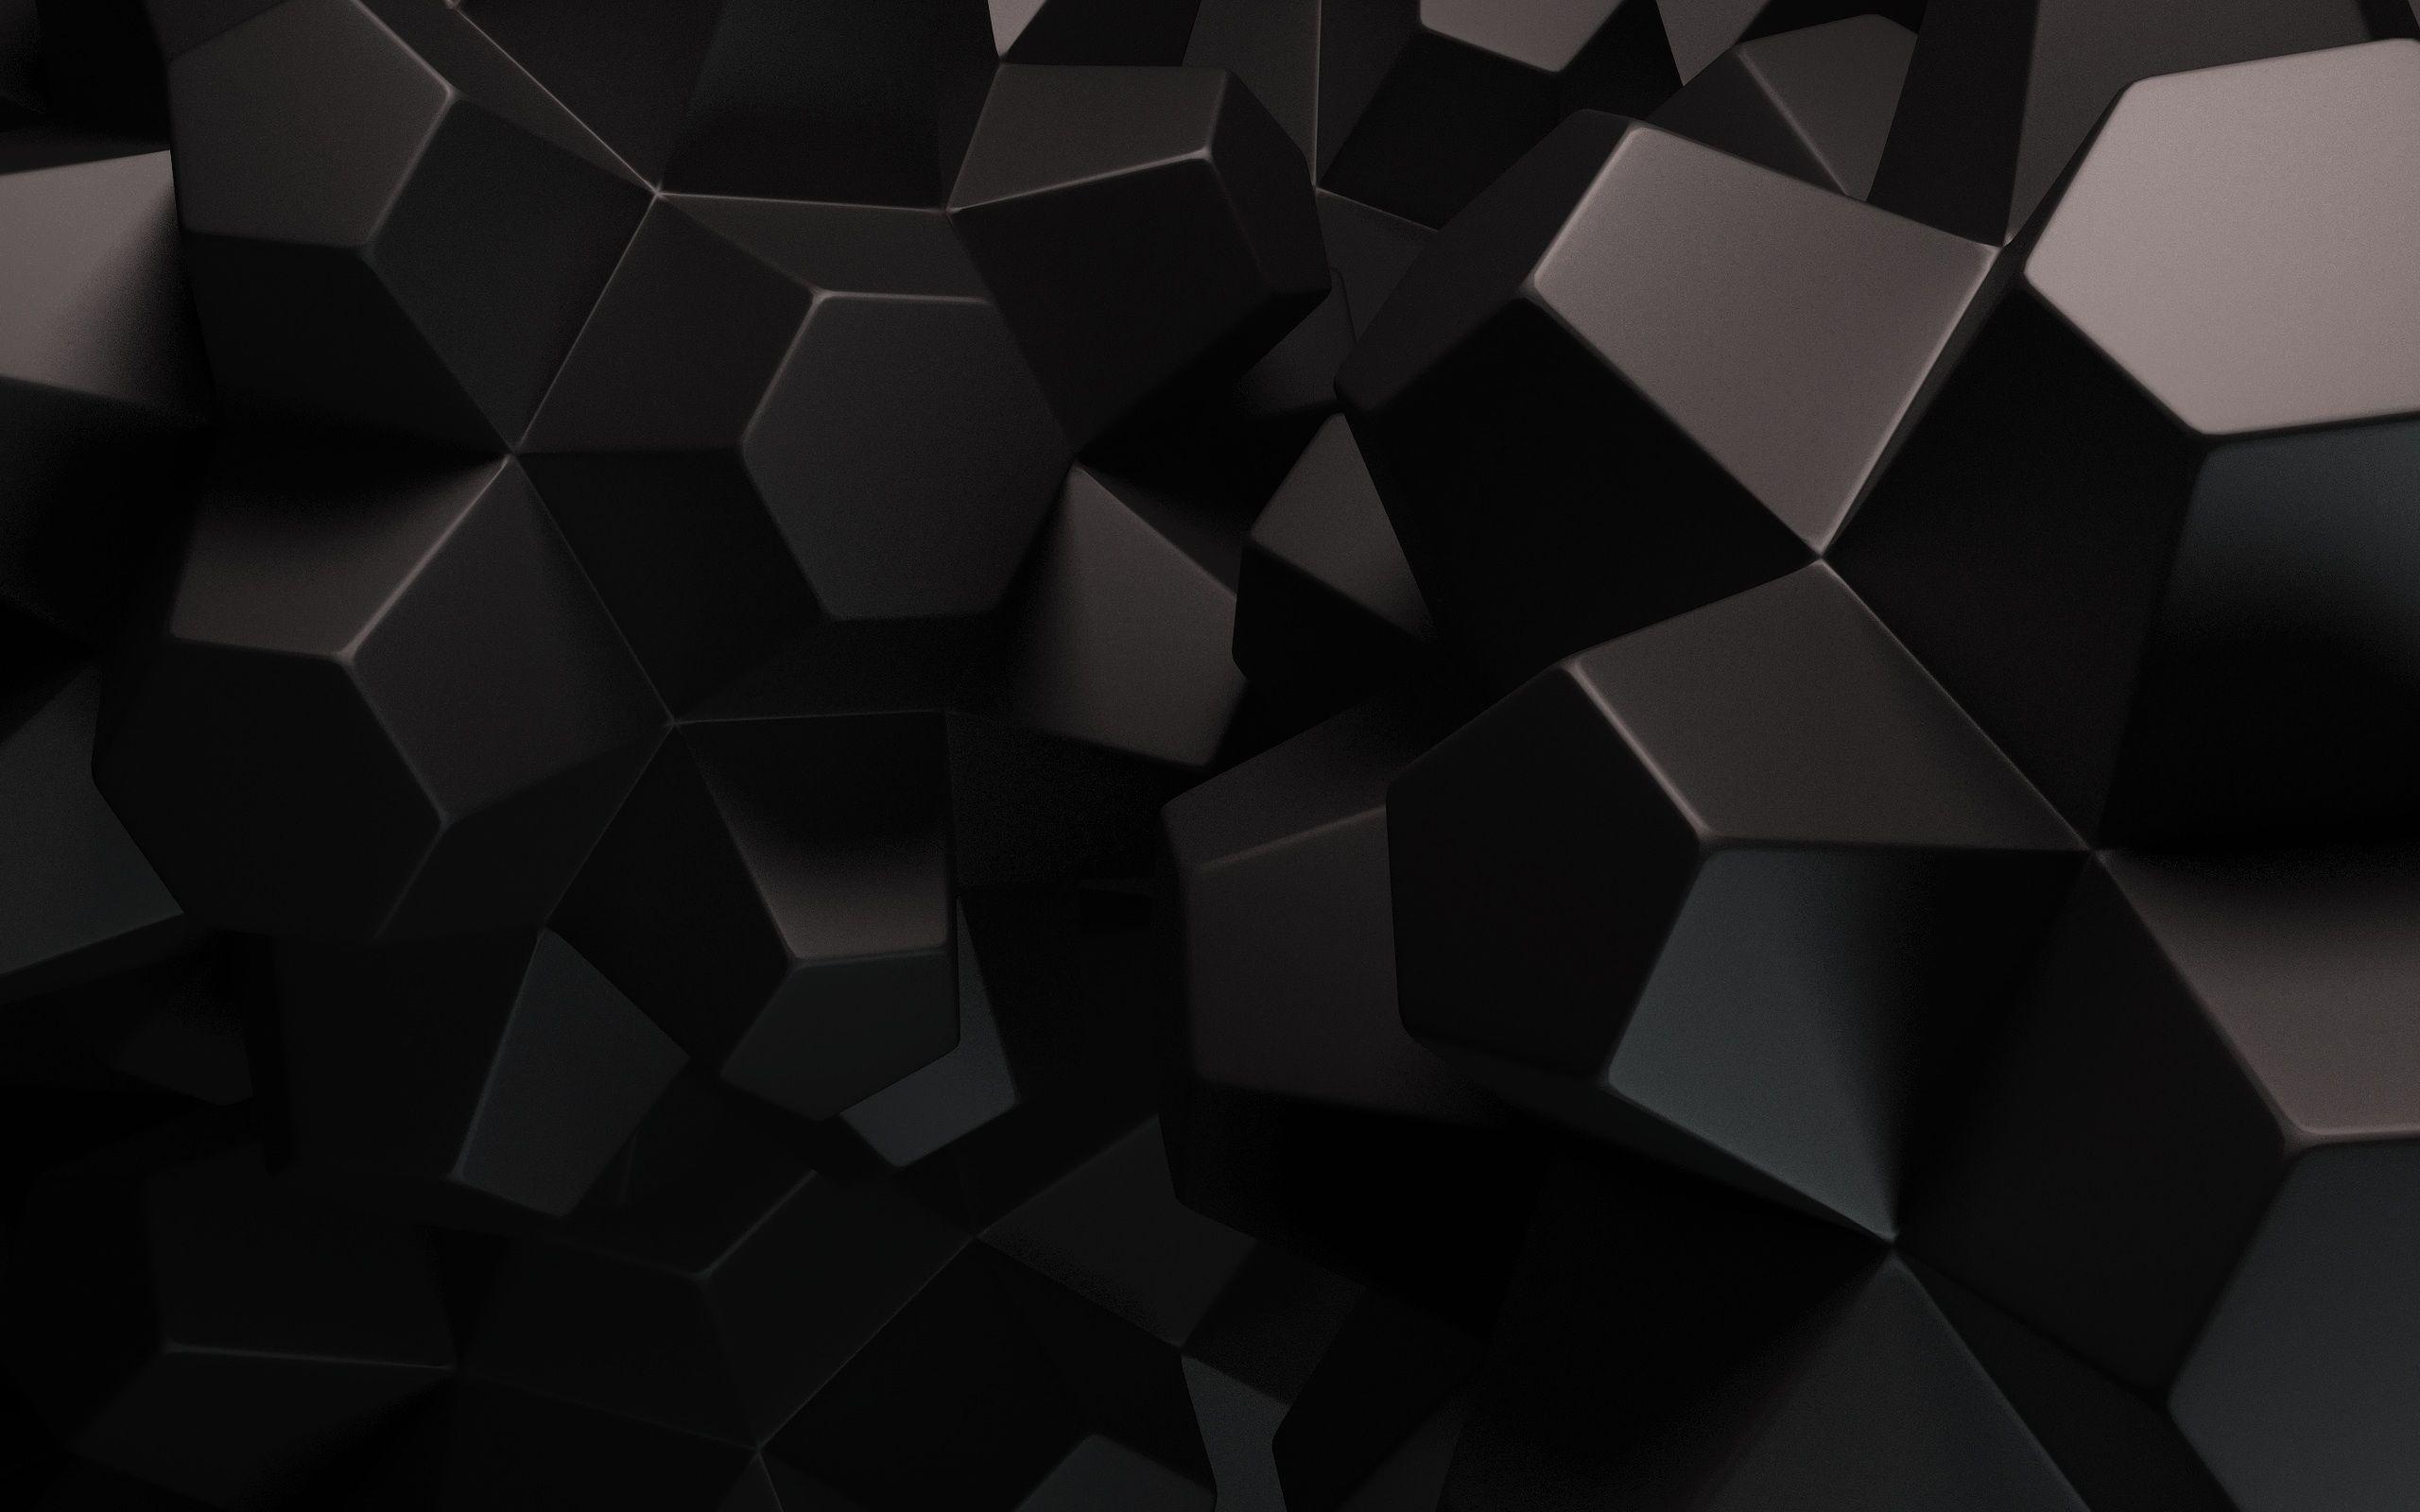 cool plain backgrounds wallpaper hd wallpapers